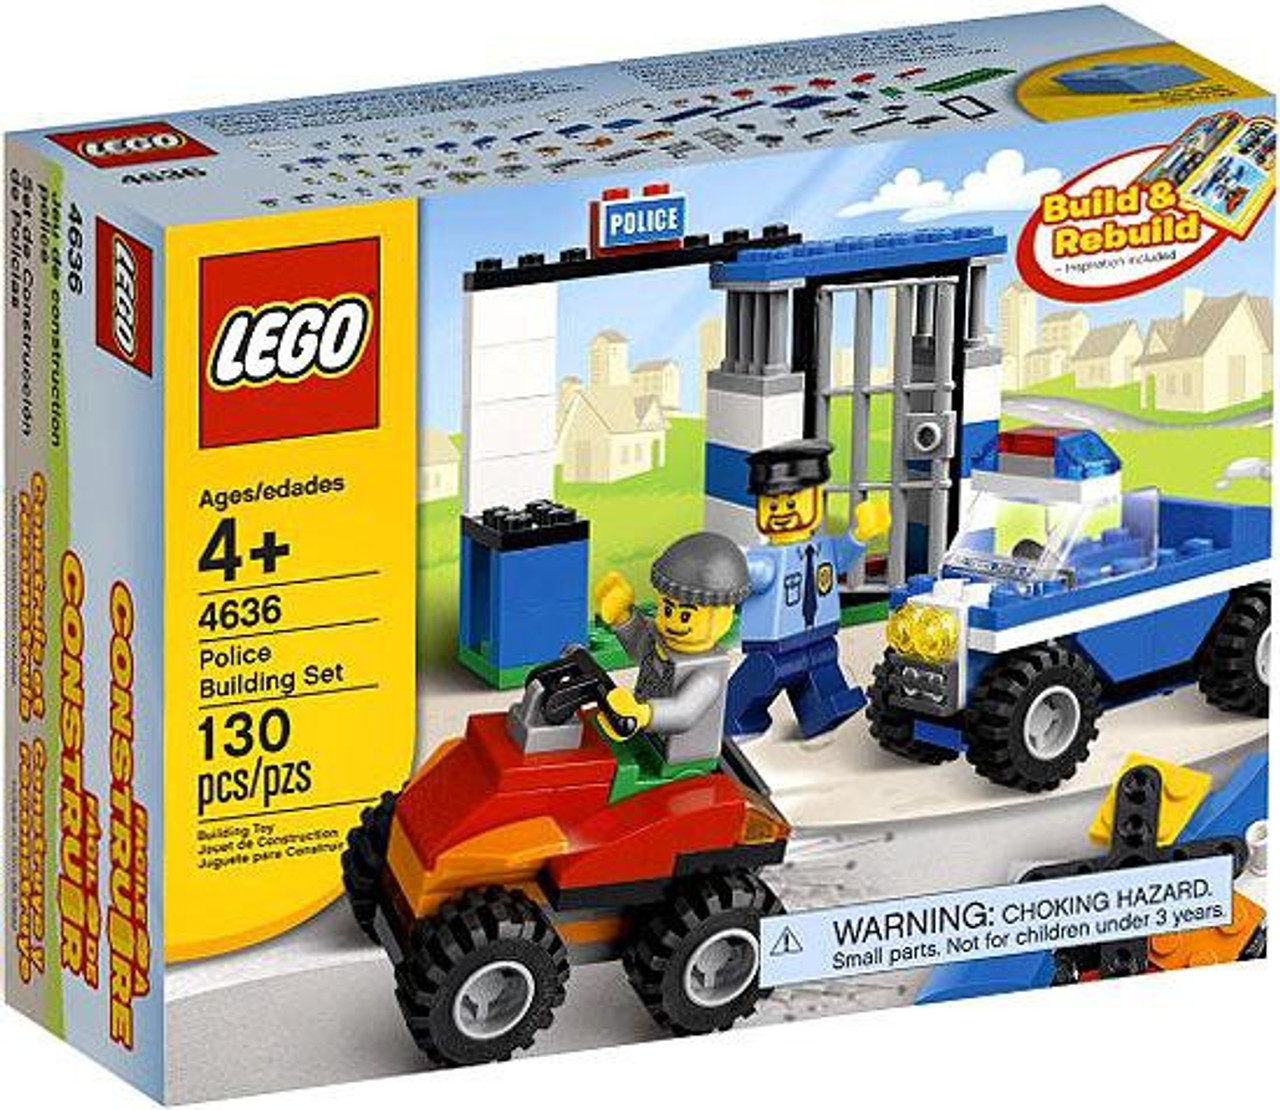 LEGO Police Building Set #4636